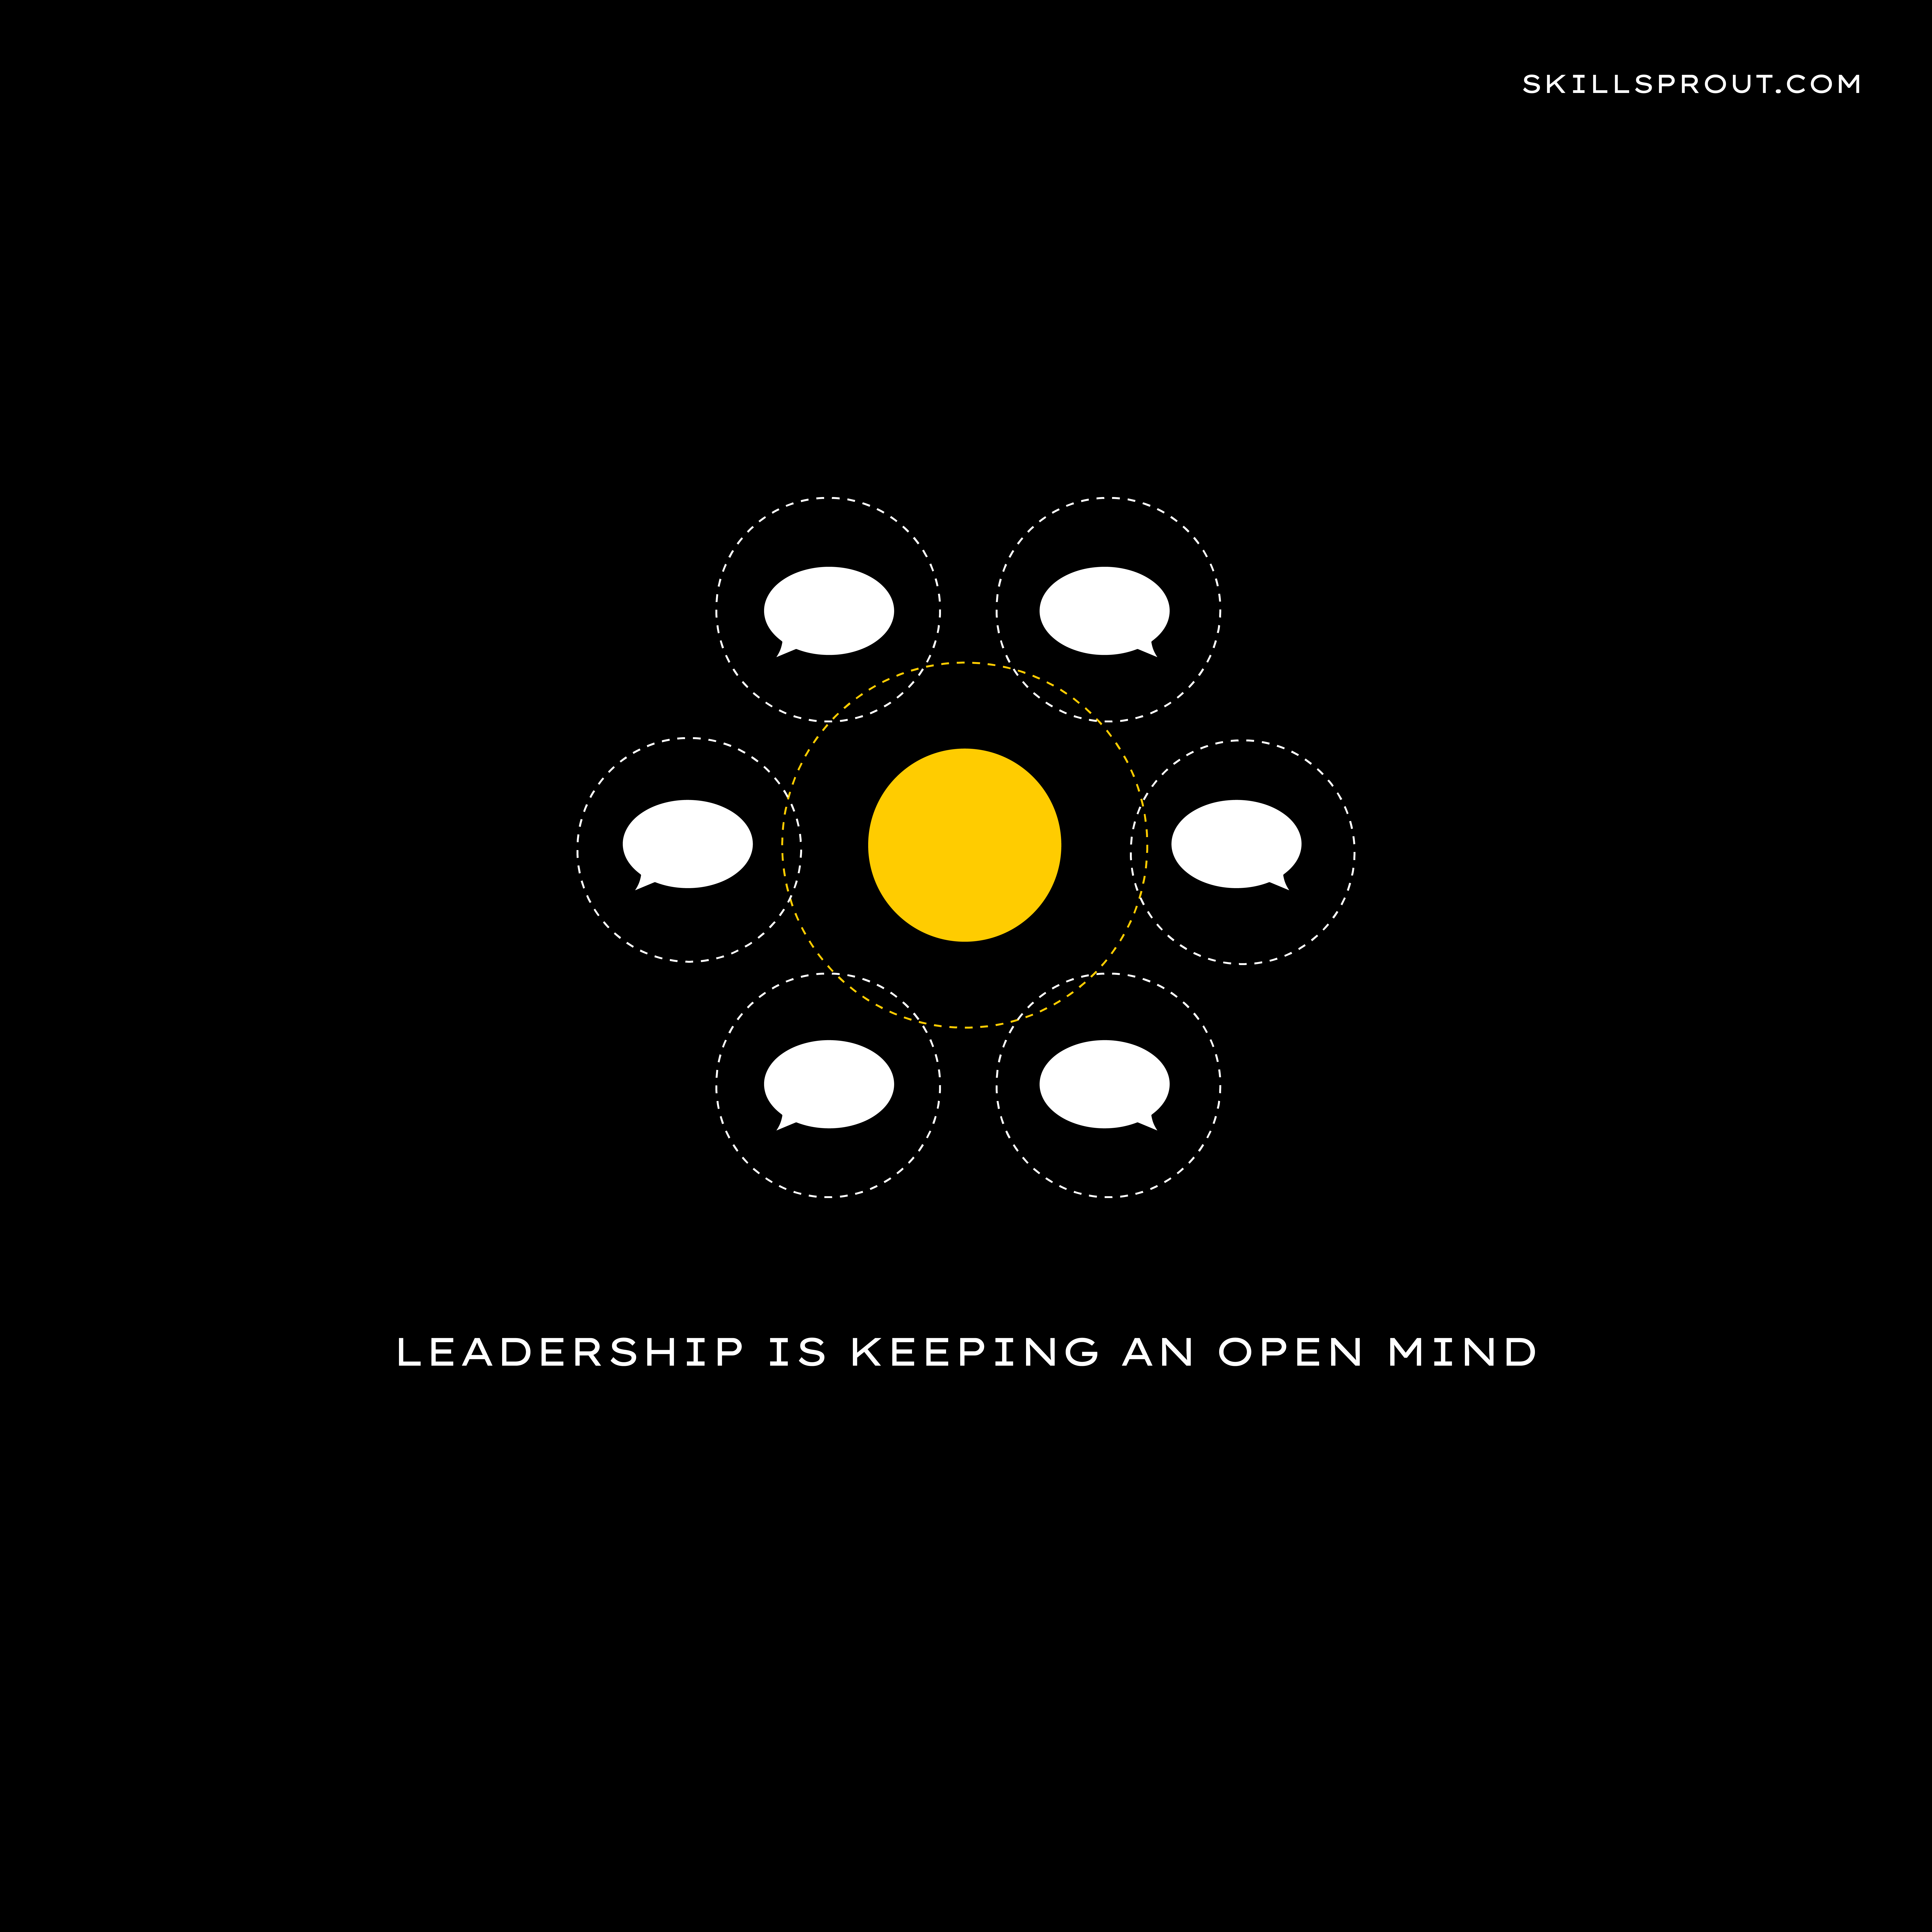 Leadership is having an open mind.